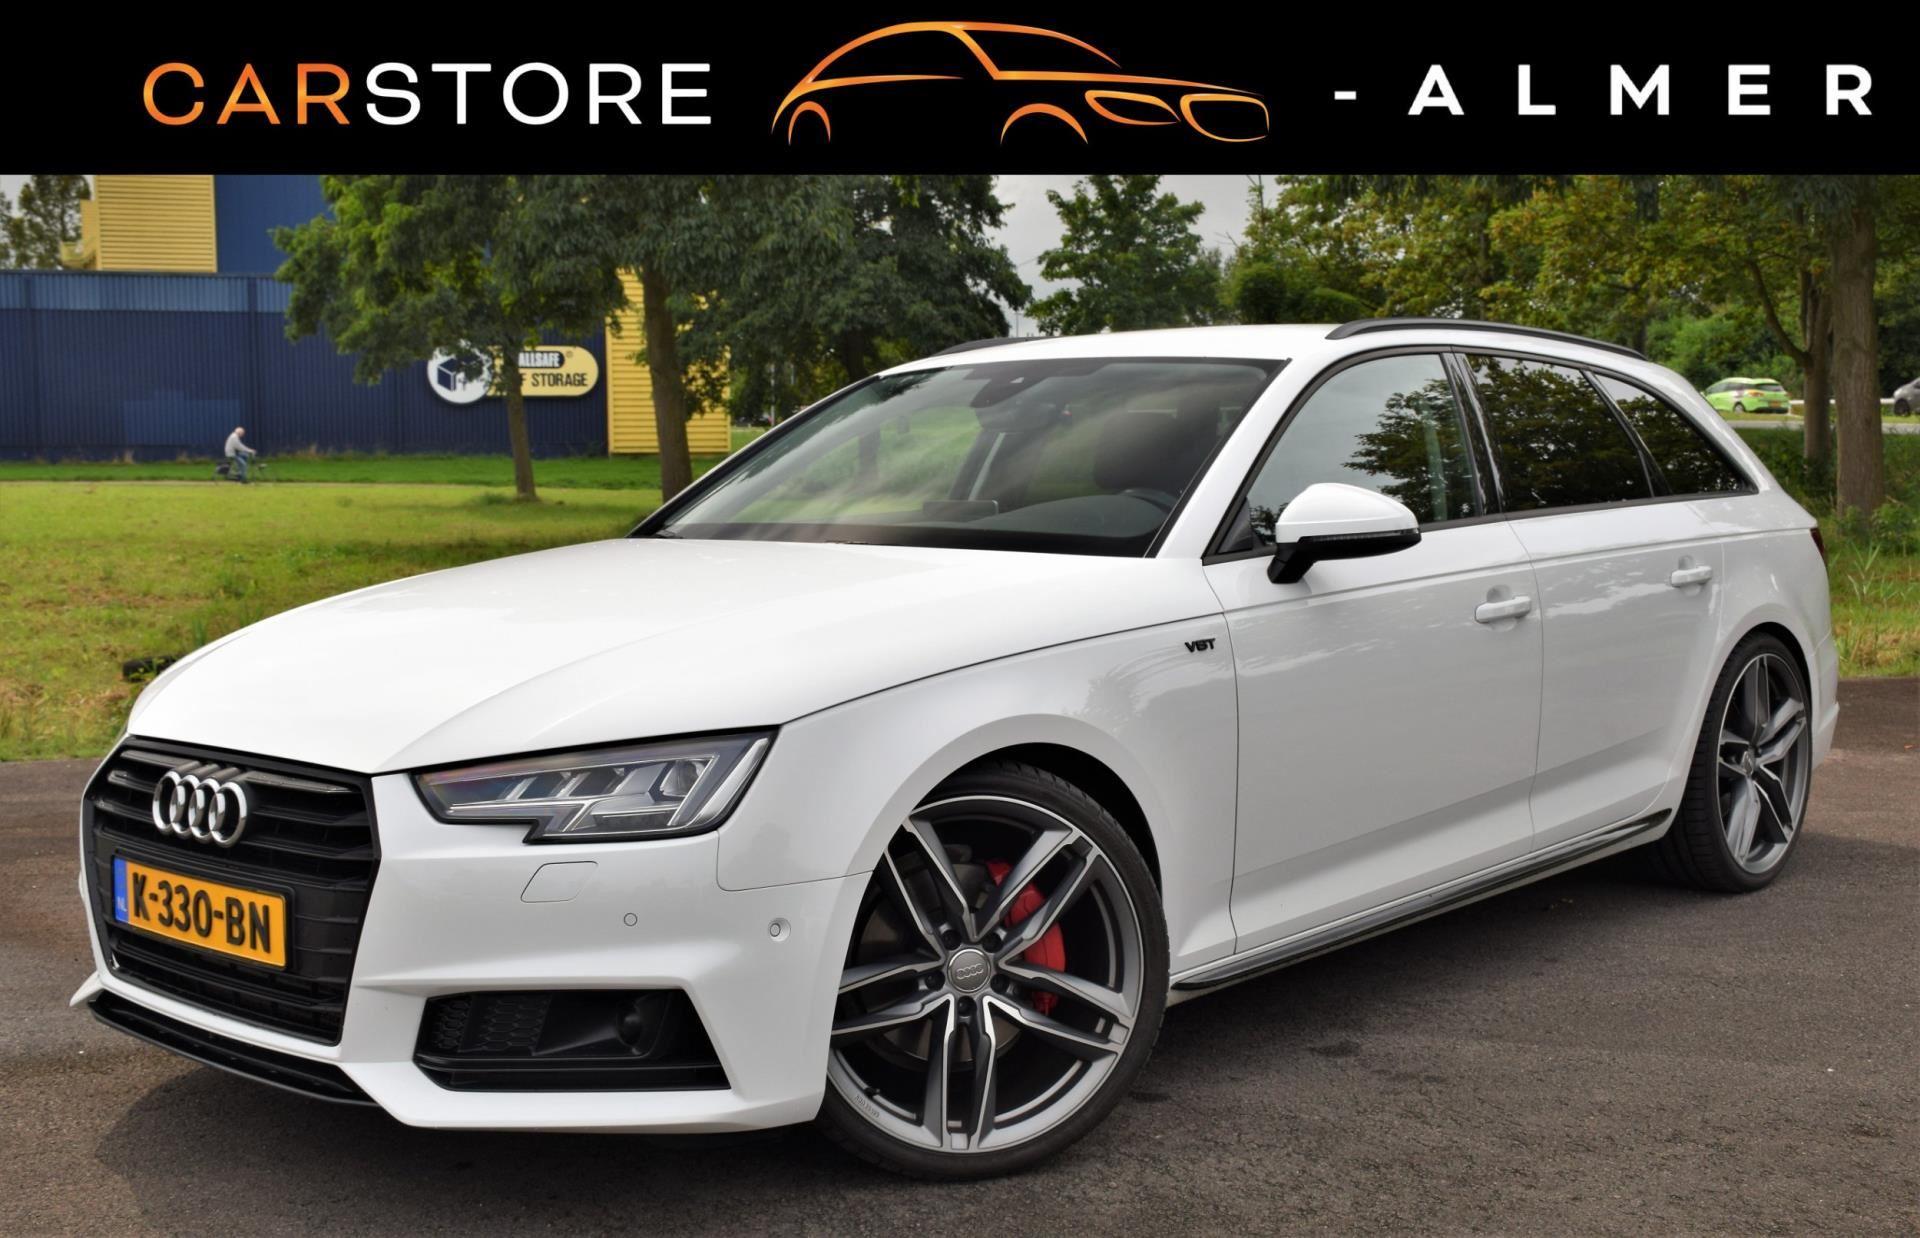 Audi A4 Avant occasion - Used Car Store Almere